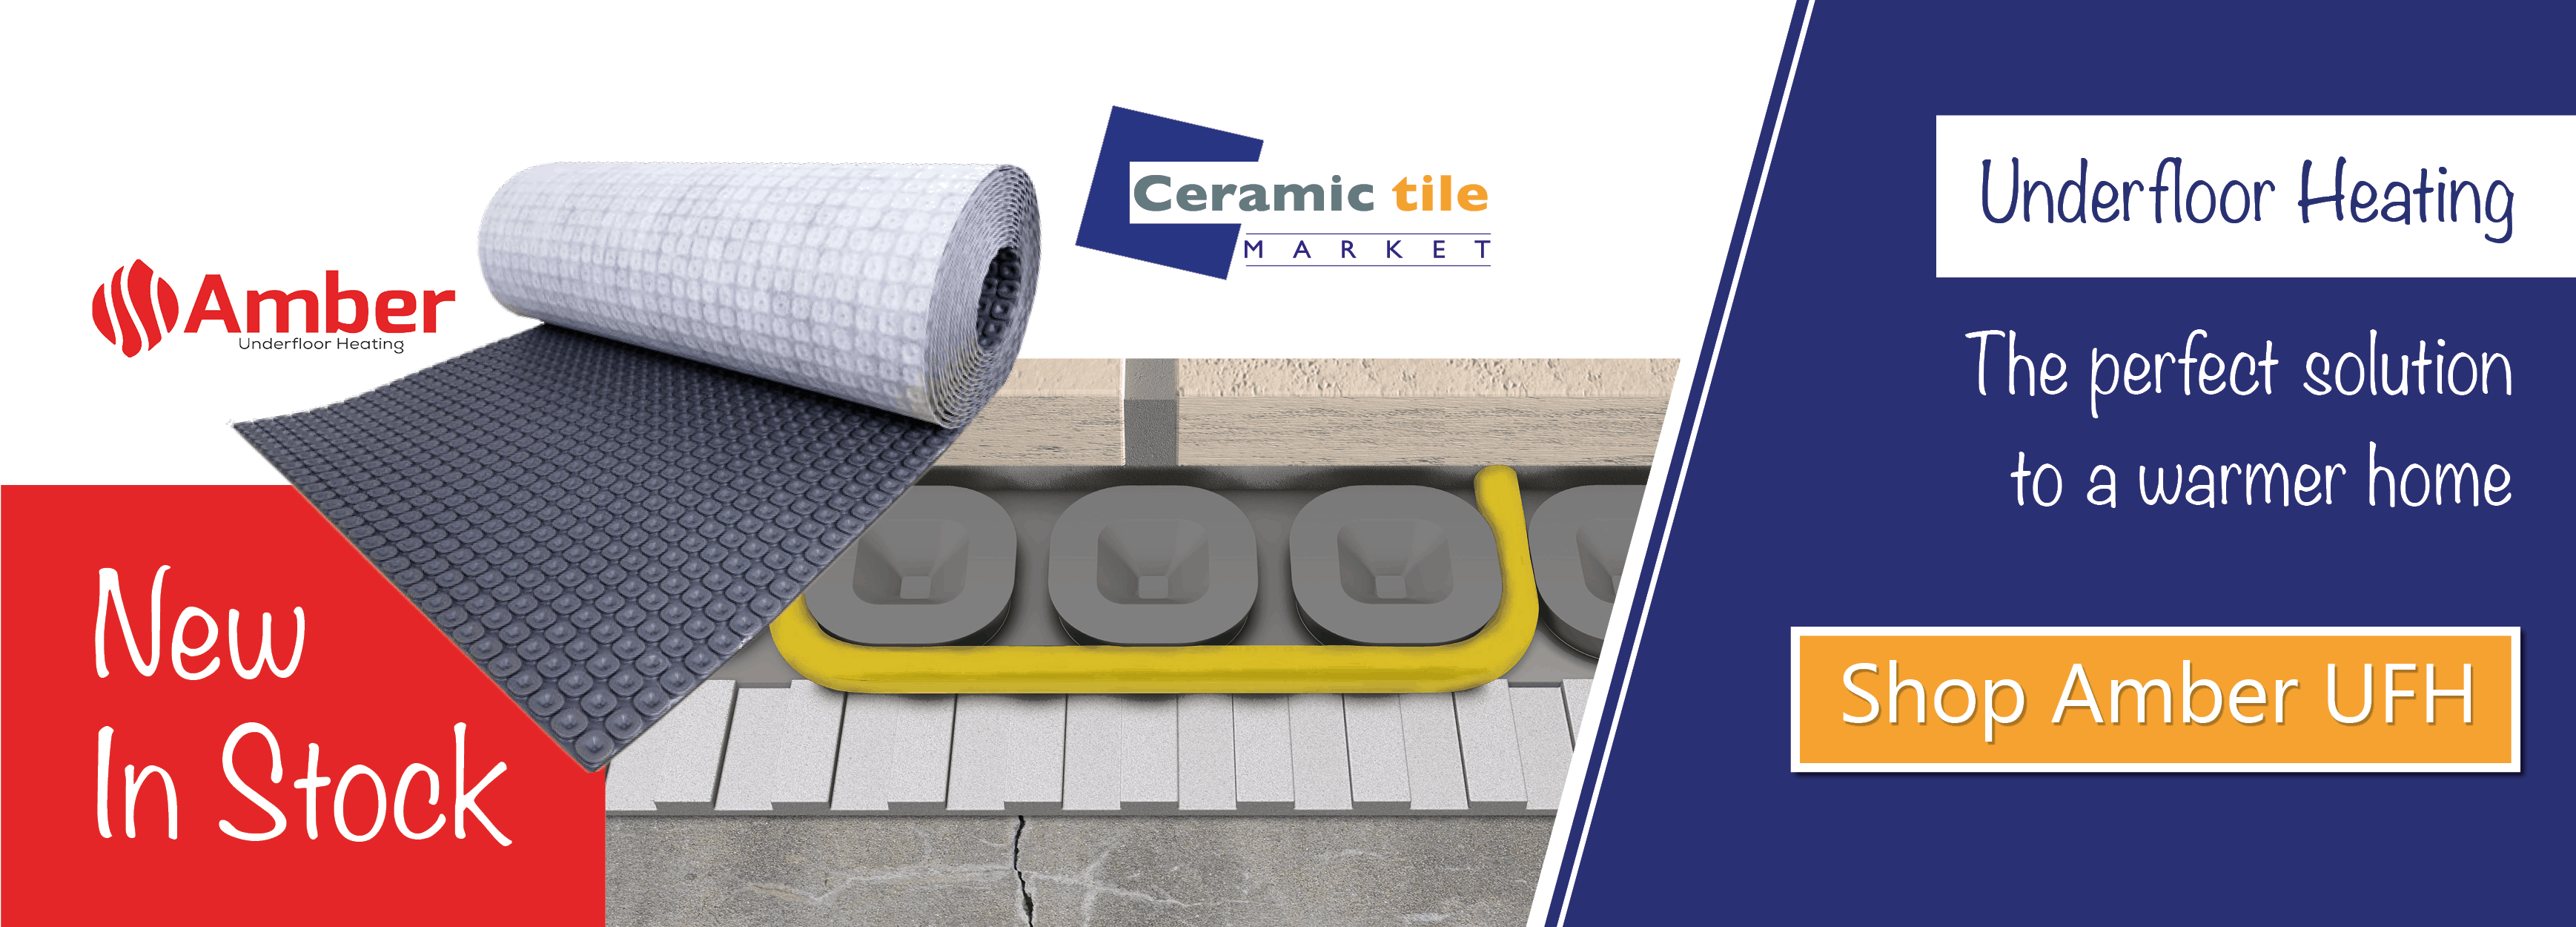 ceramic tile market underfloor heating emc tiles